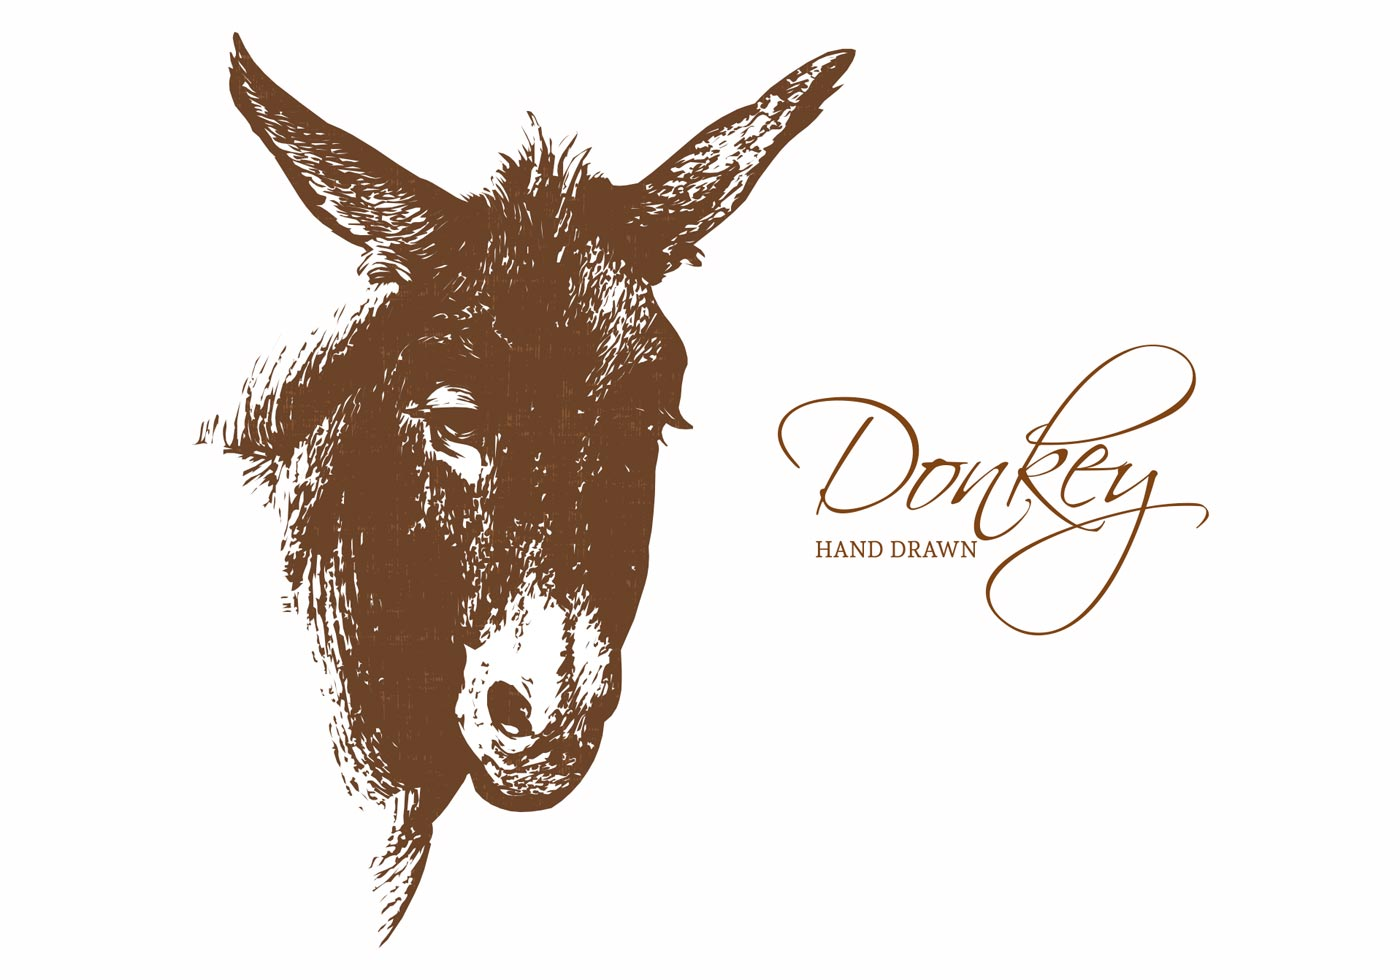 Hand Drawn Donkey Portrait Vector - Download Free Vector Art, Stock